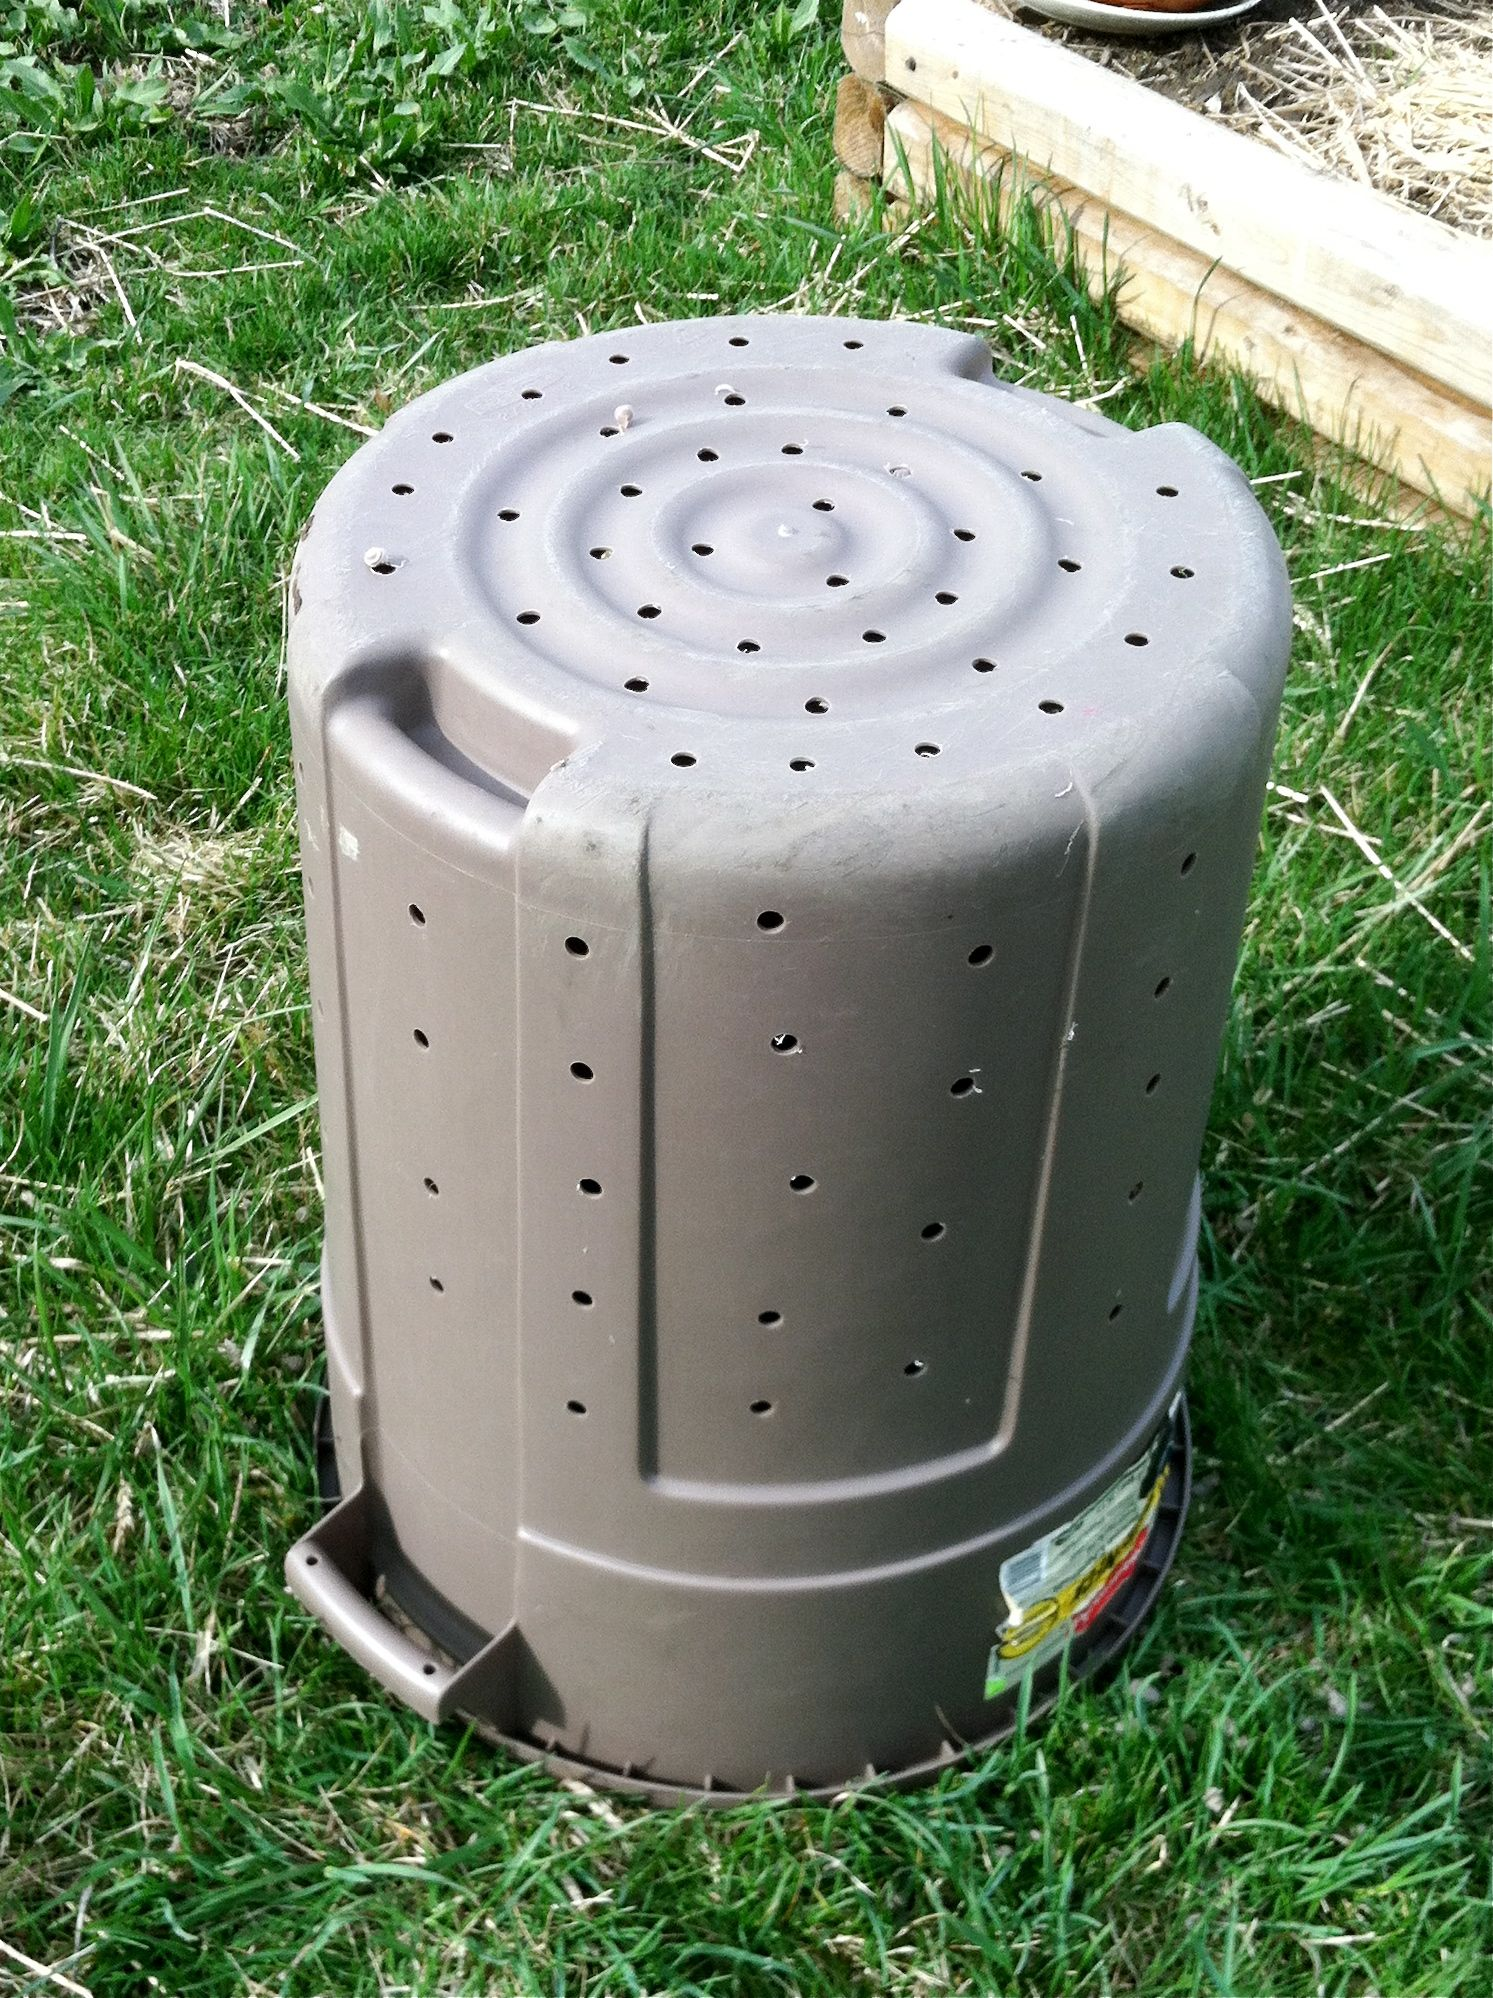 Diy Trash Can Composter Plans Pdf Download Horizontal